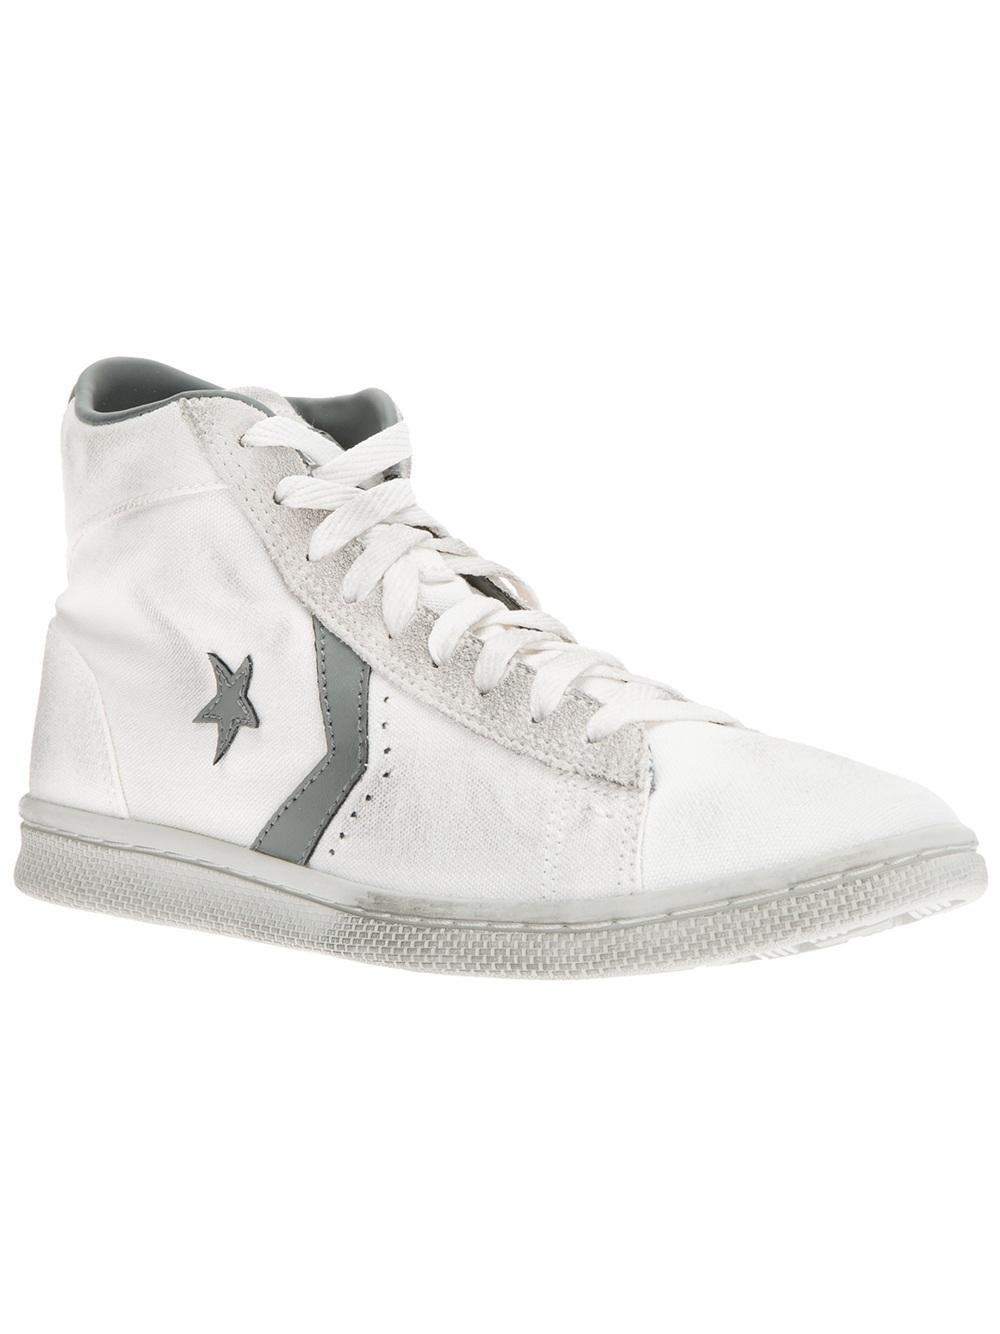 Converse Pro-Leather LP Mid Sneaker (Women) ObPOSMjdL